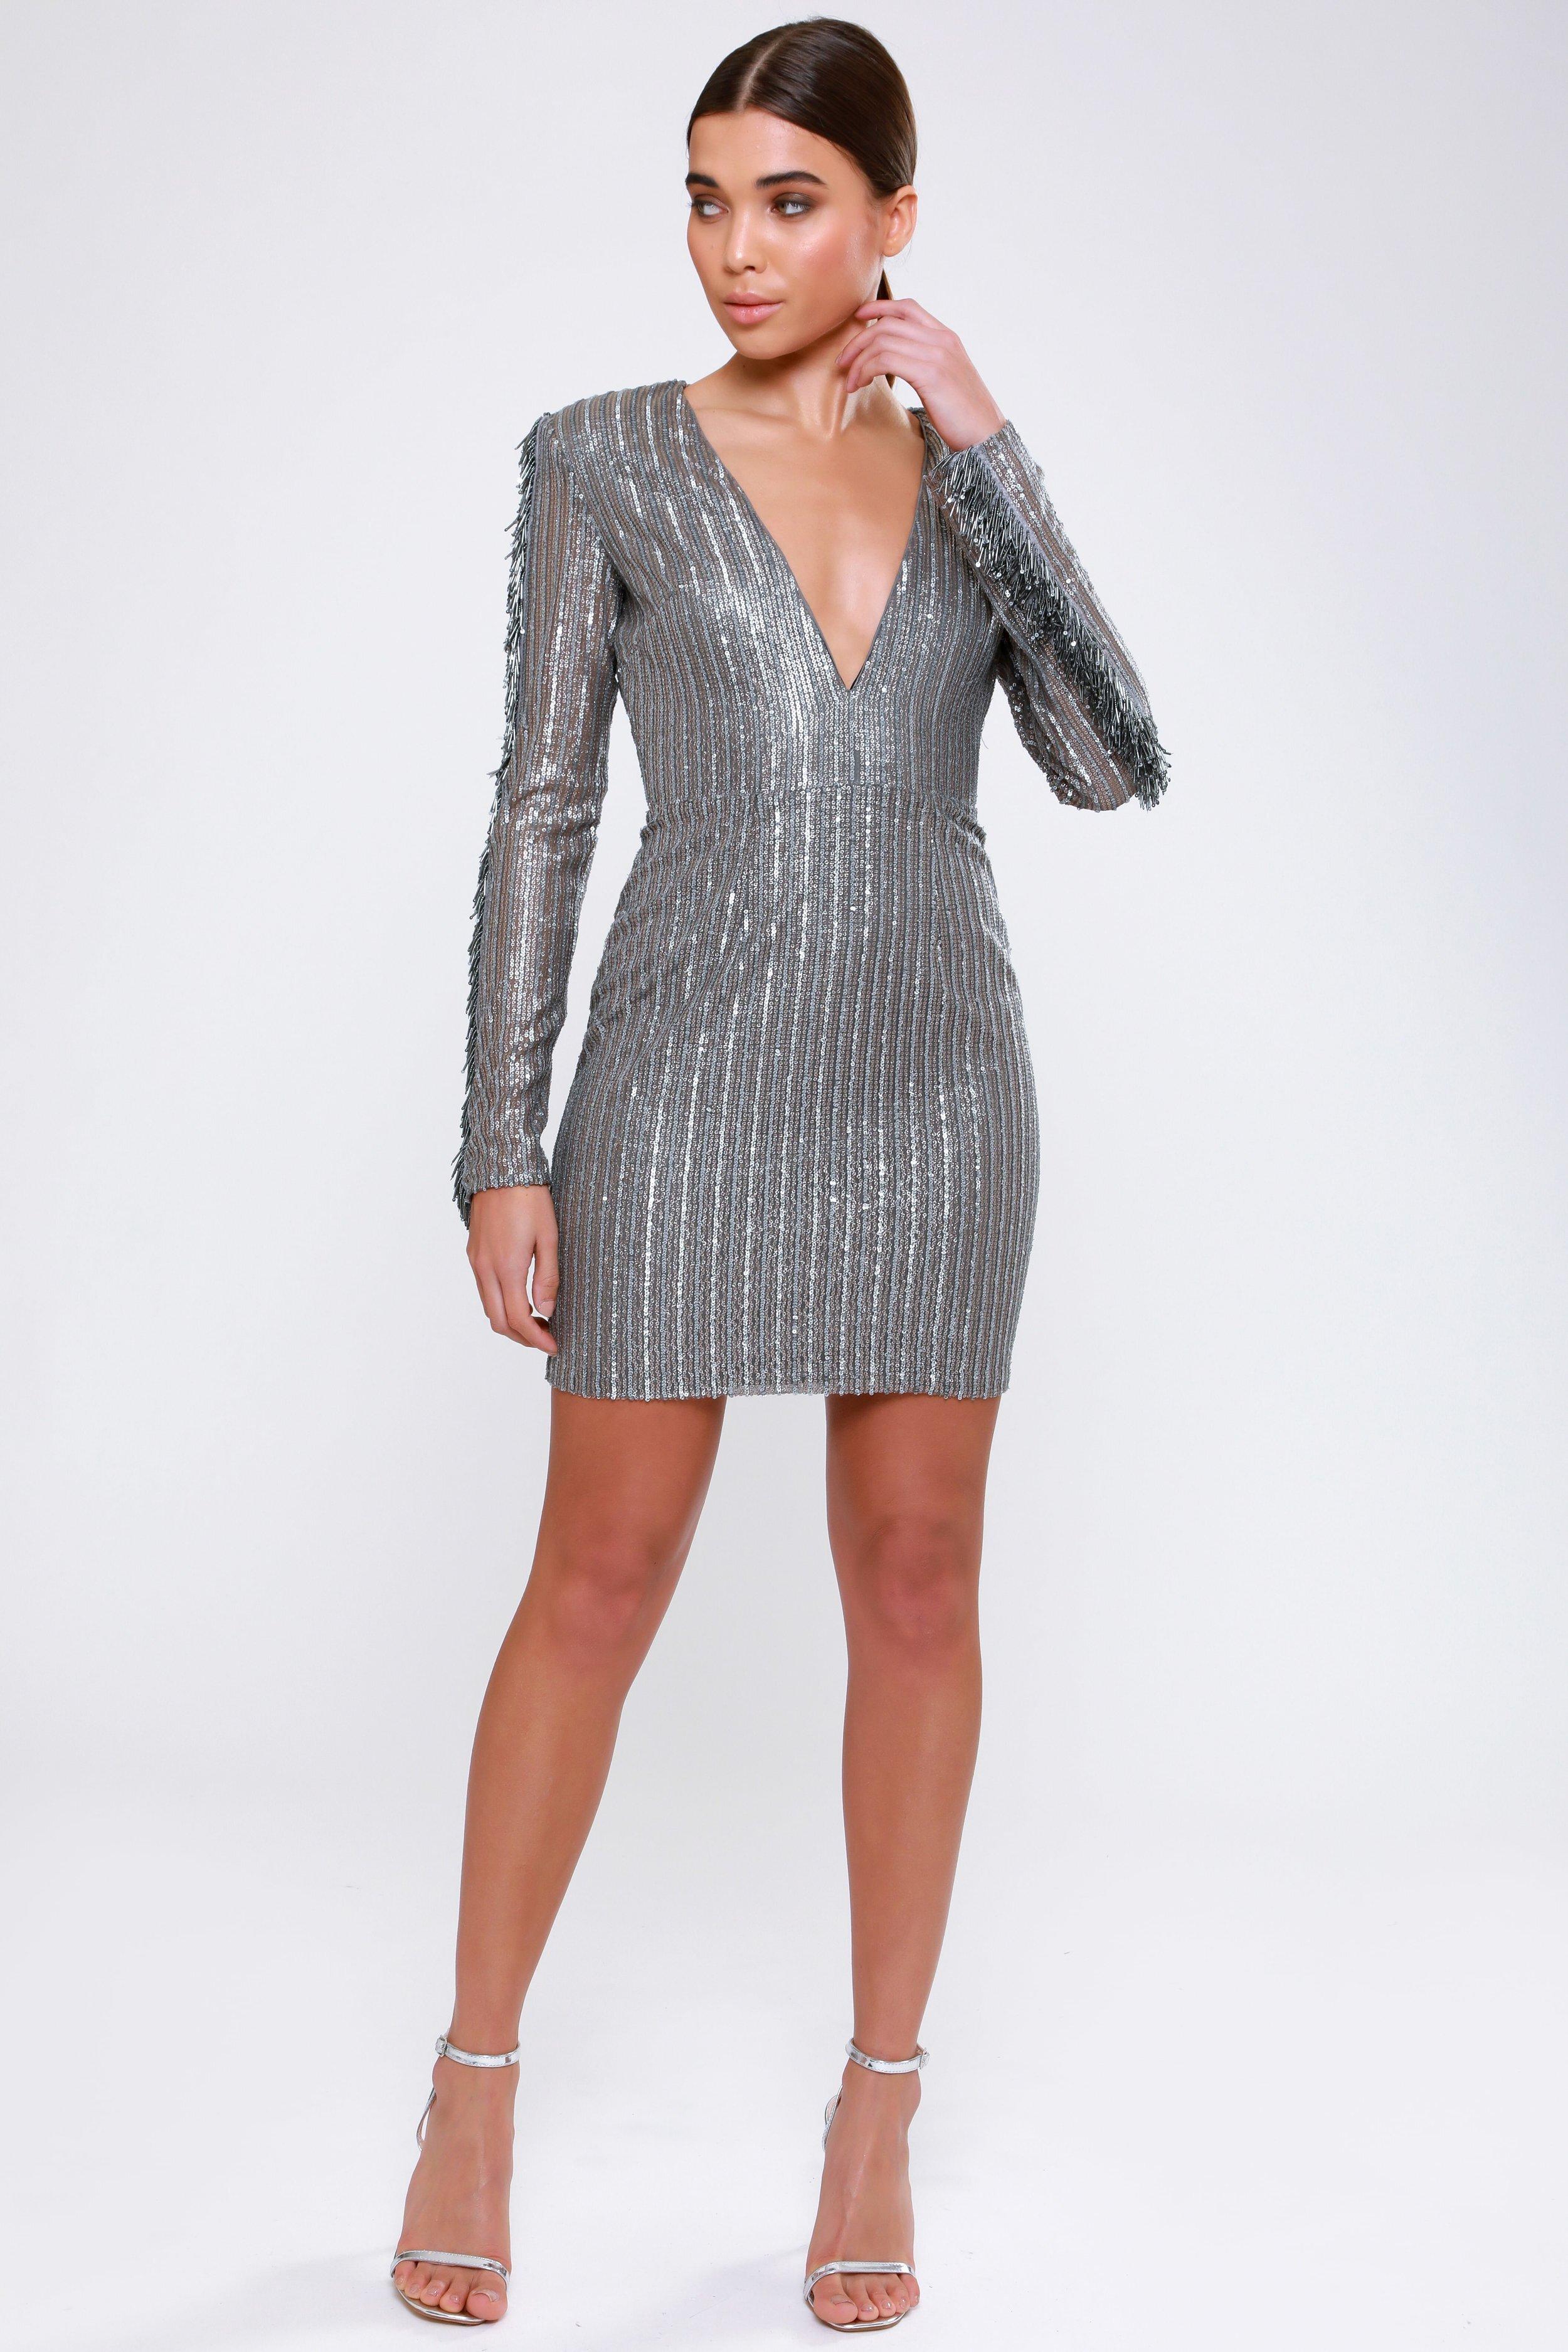 Plunge Sequin  Mini Dress   £79.00